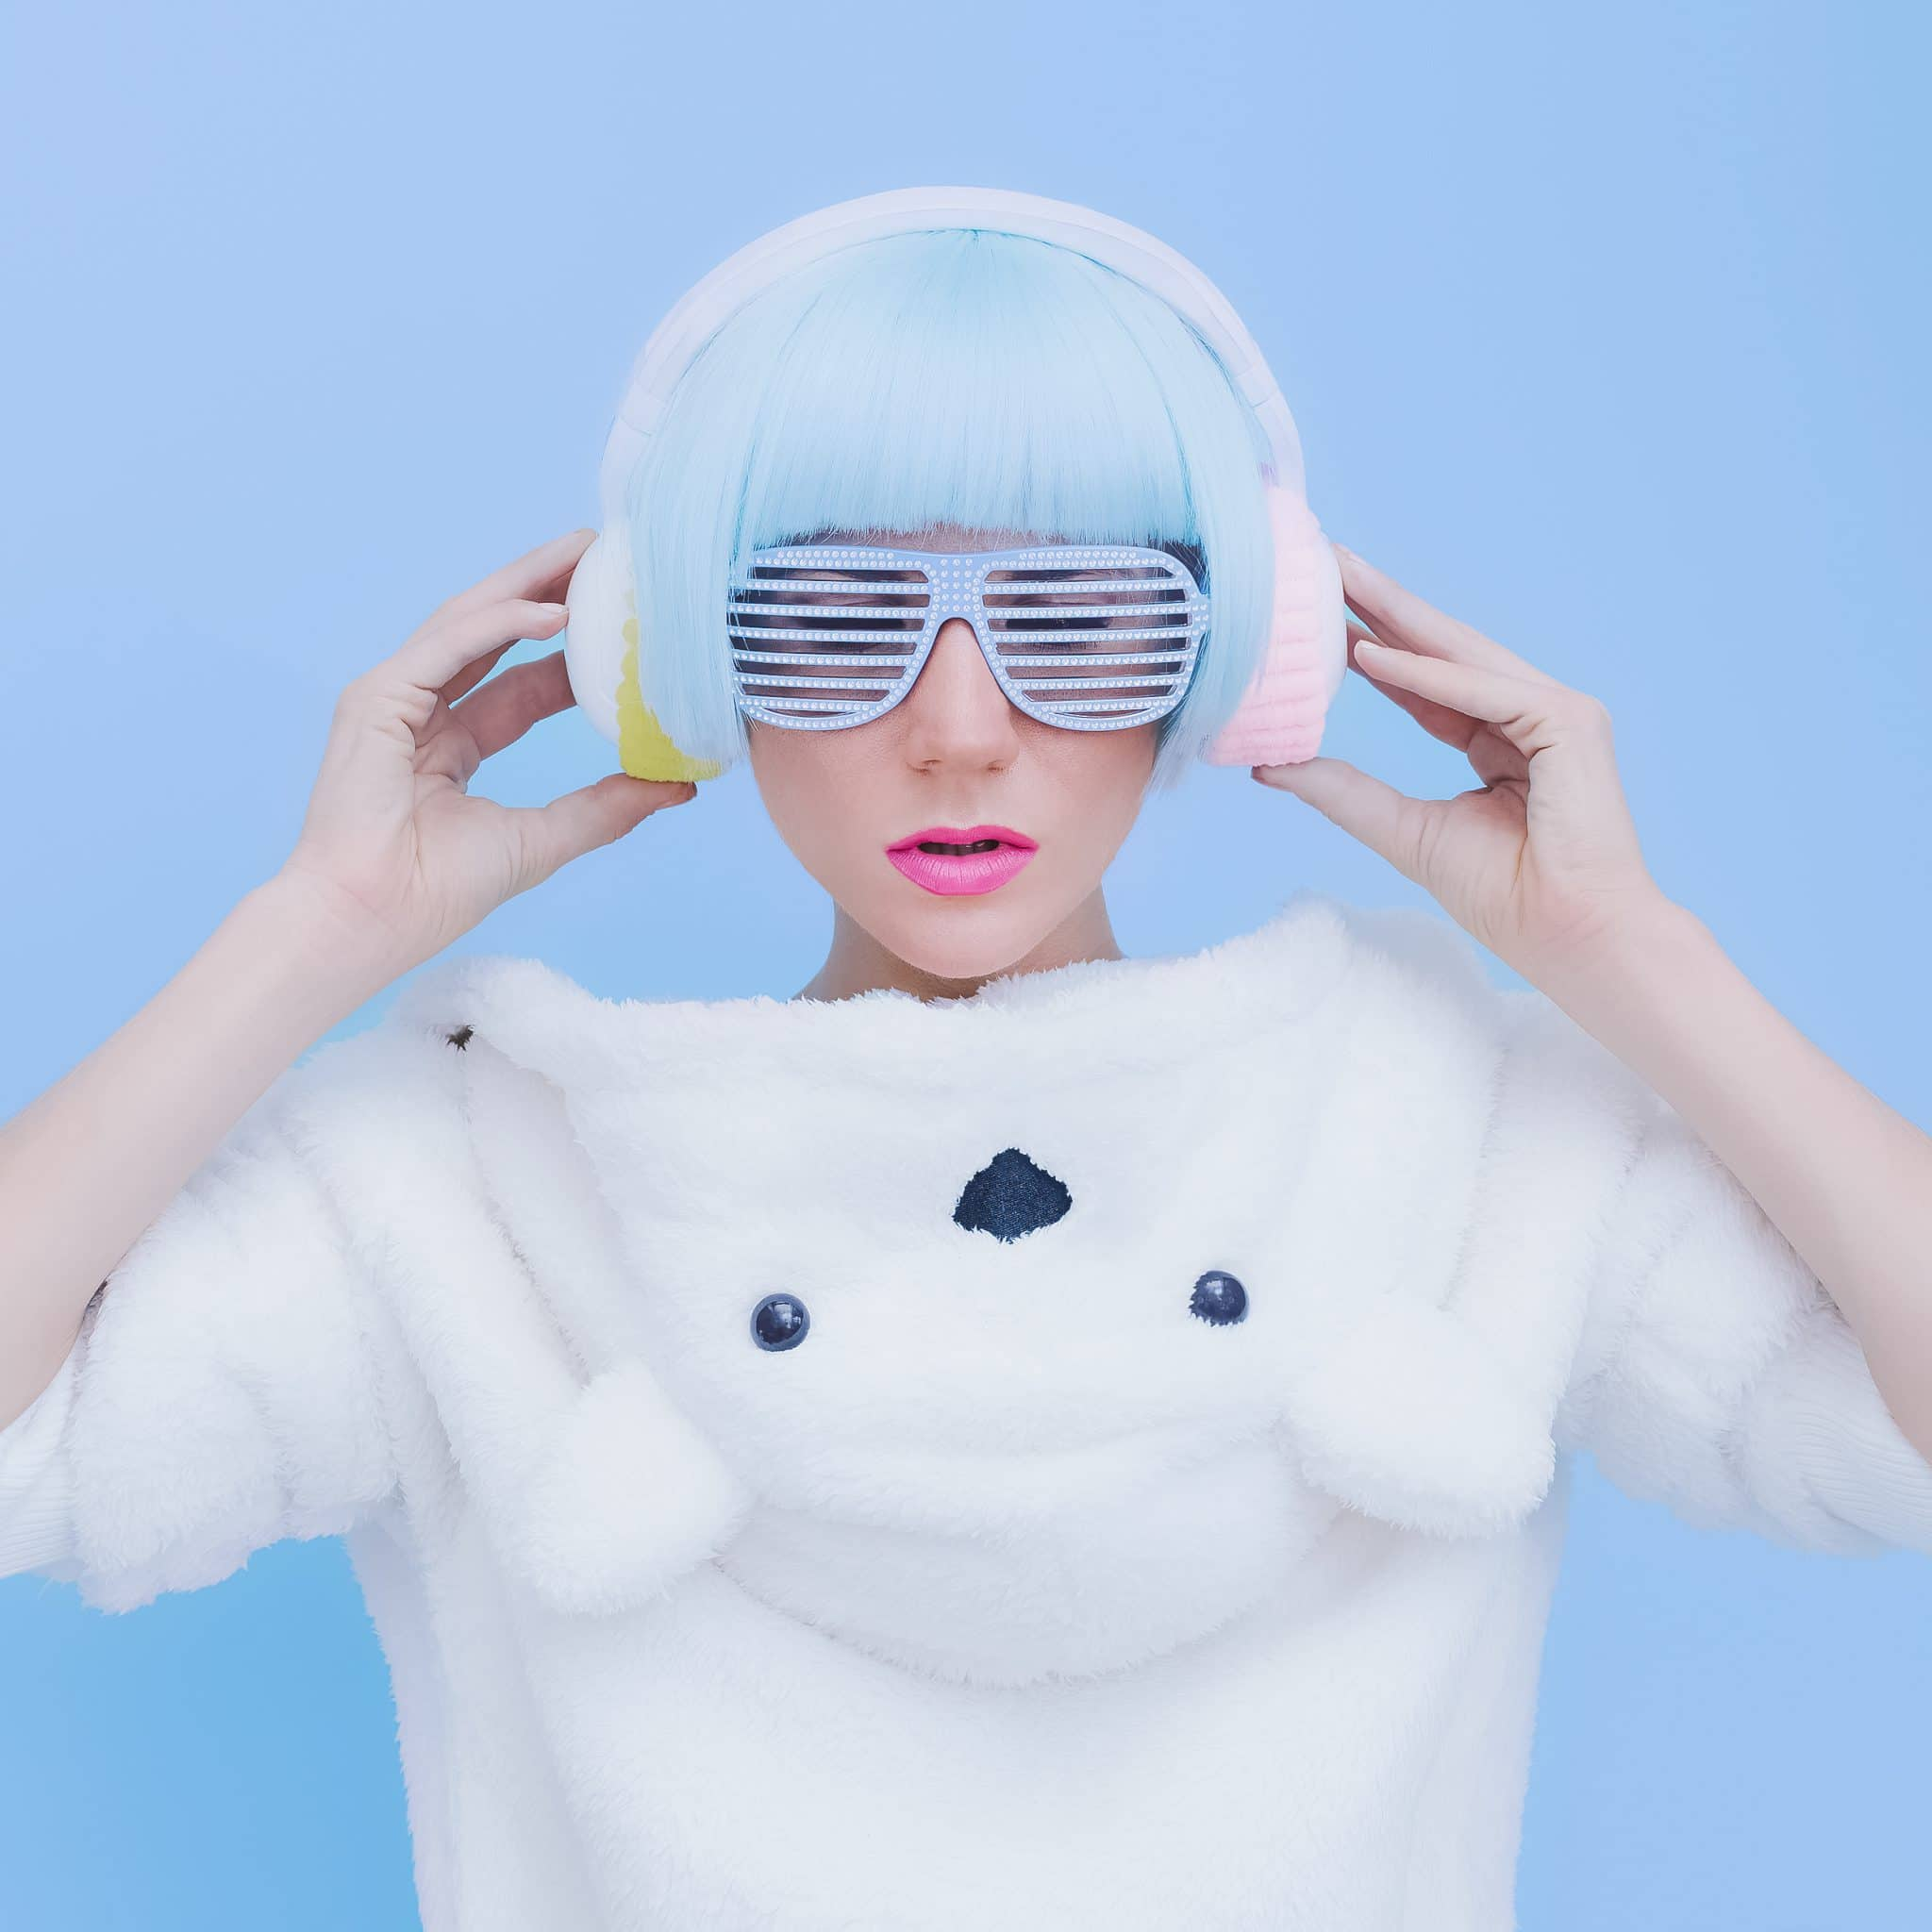 teddy-bear-girl-dj-on-a-blue-background-crazy-PMZUD22